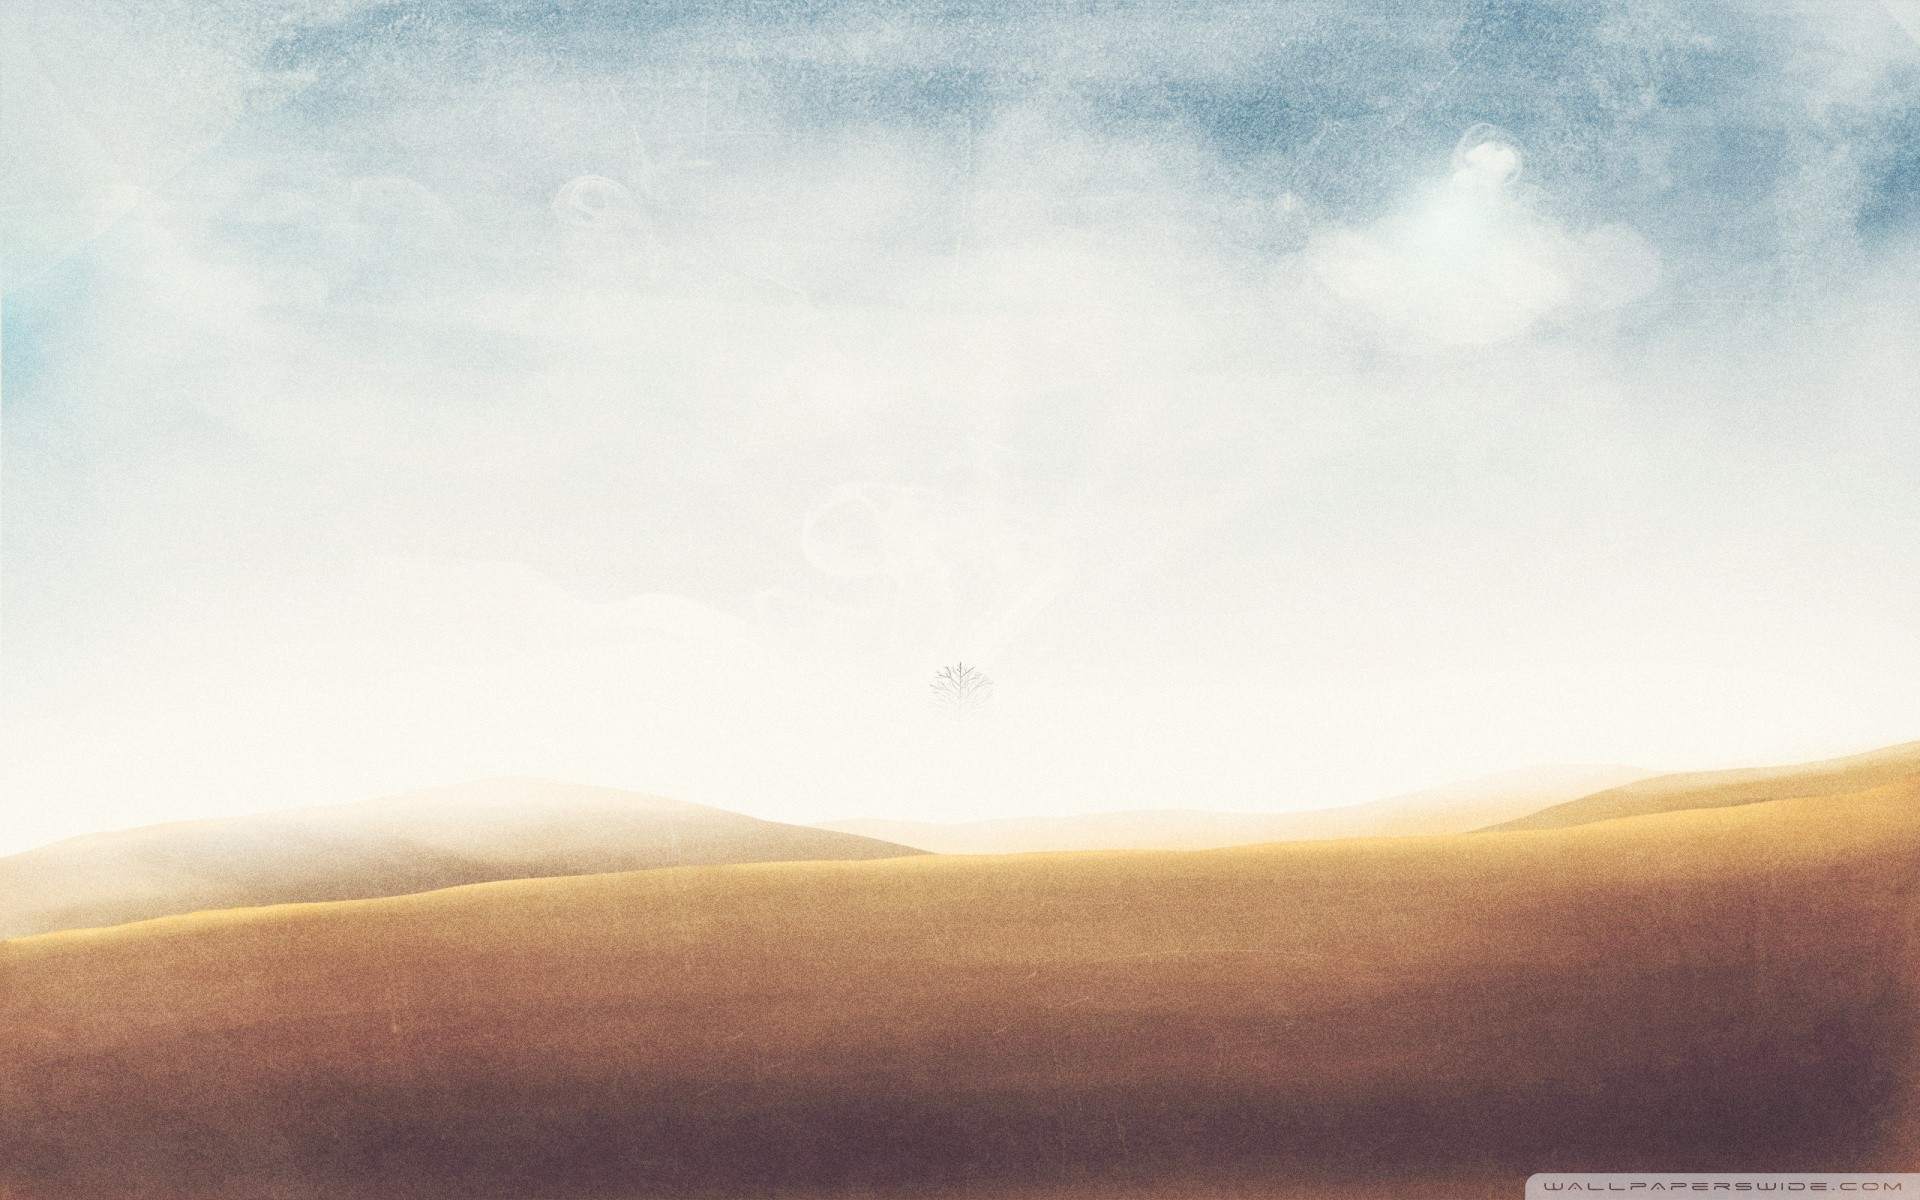 Desert Vintage Cool Twitter Backgrounds